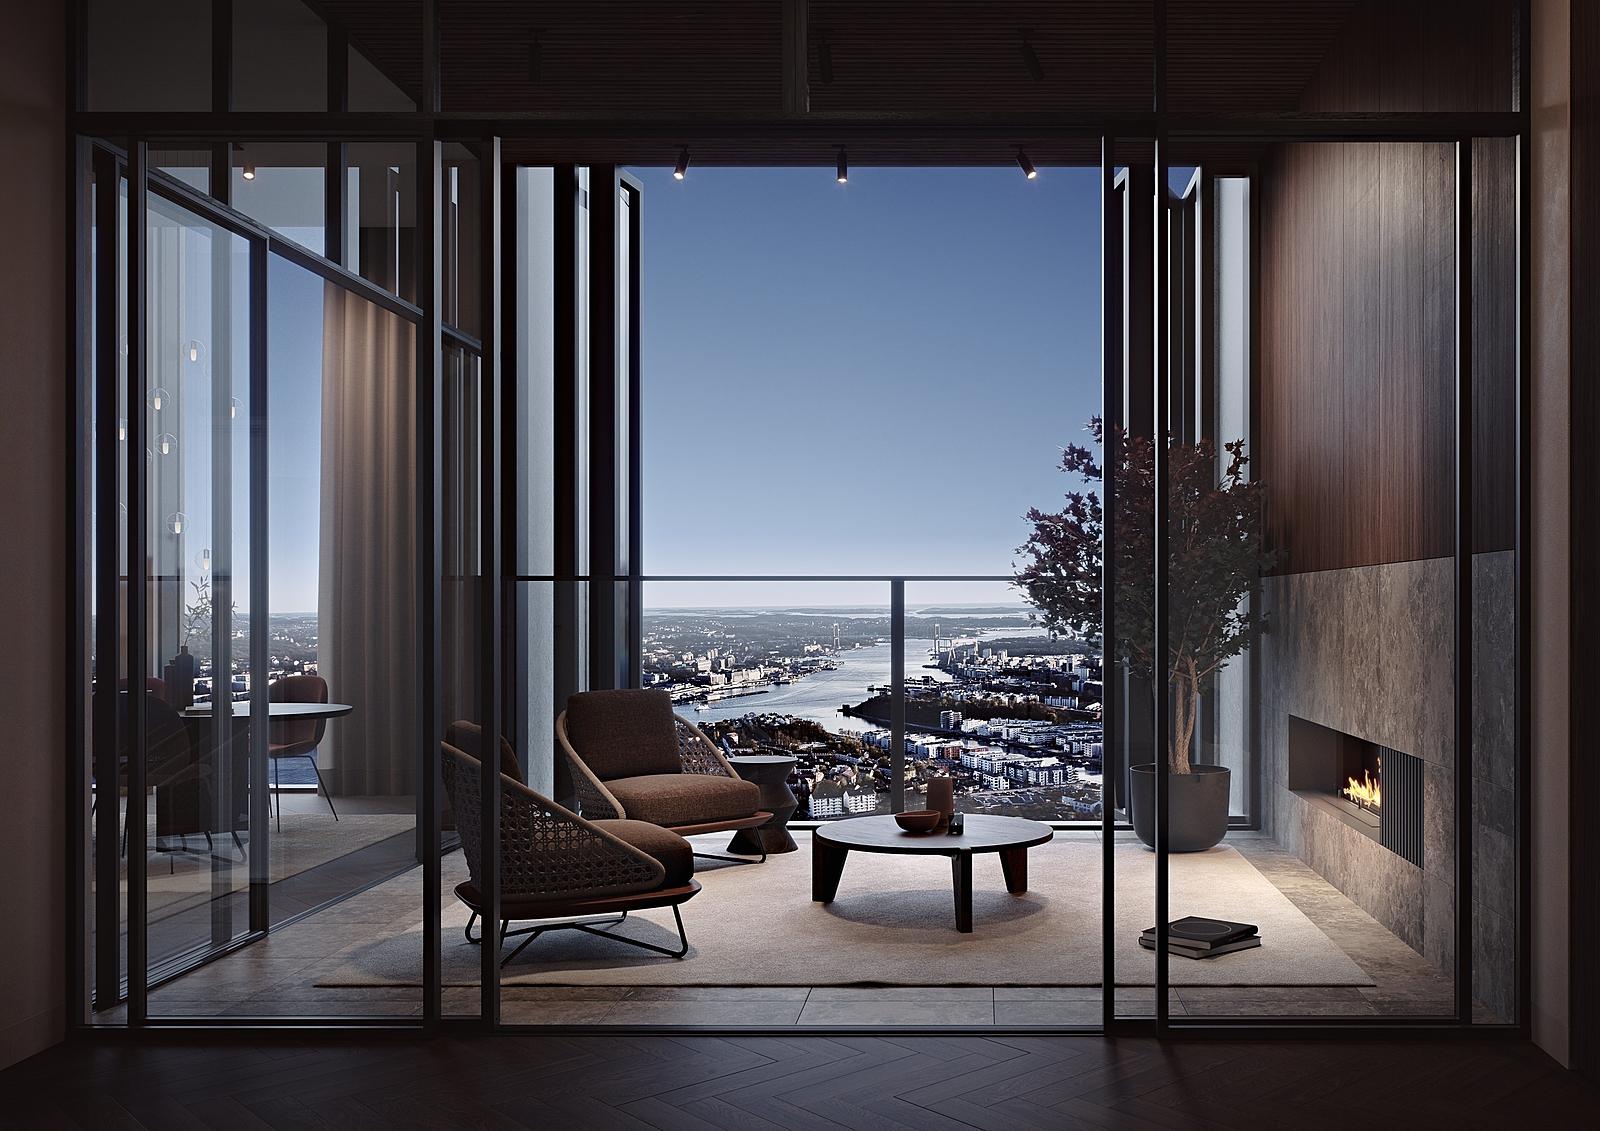 Karlatornet Penthouse 001 - Vinterträdgård v4.0001